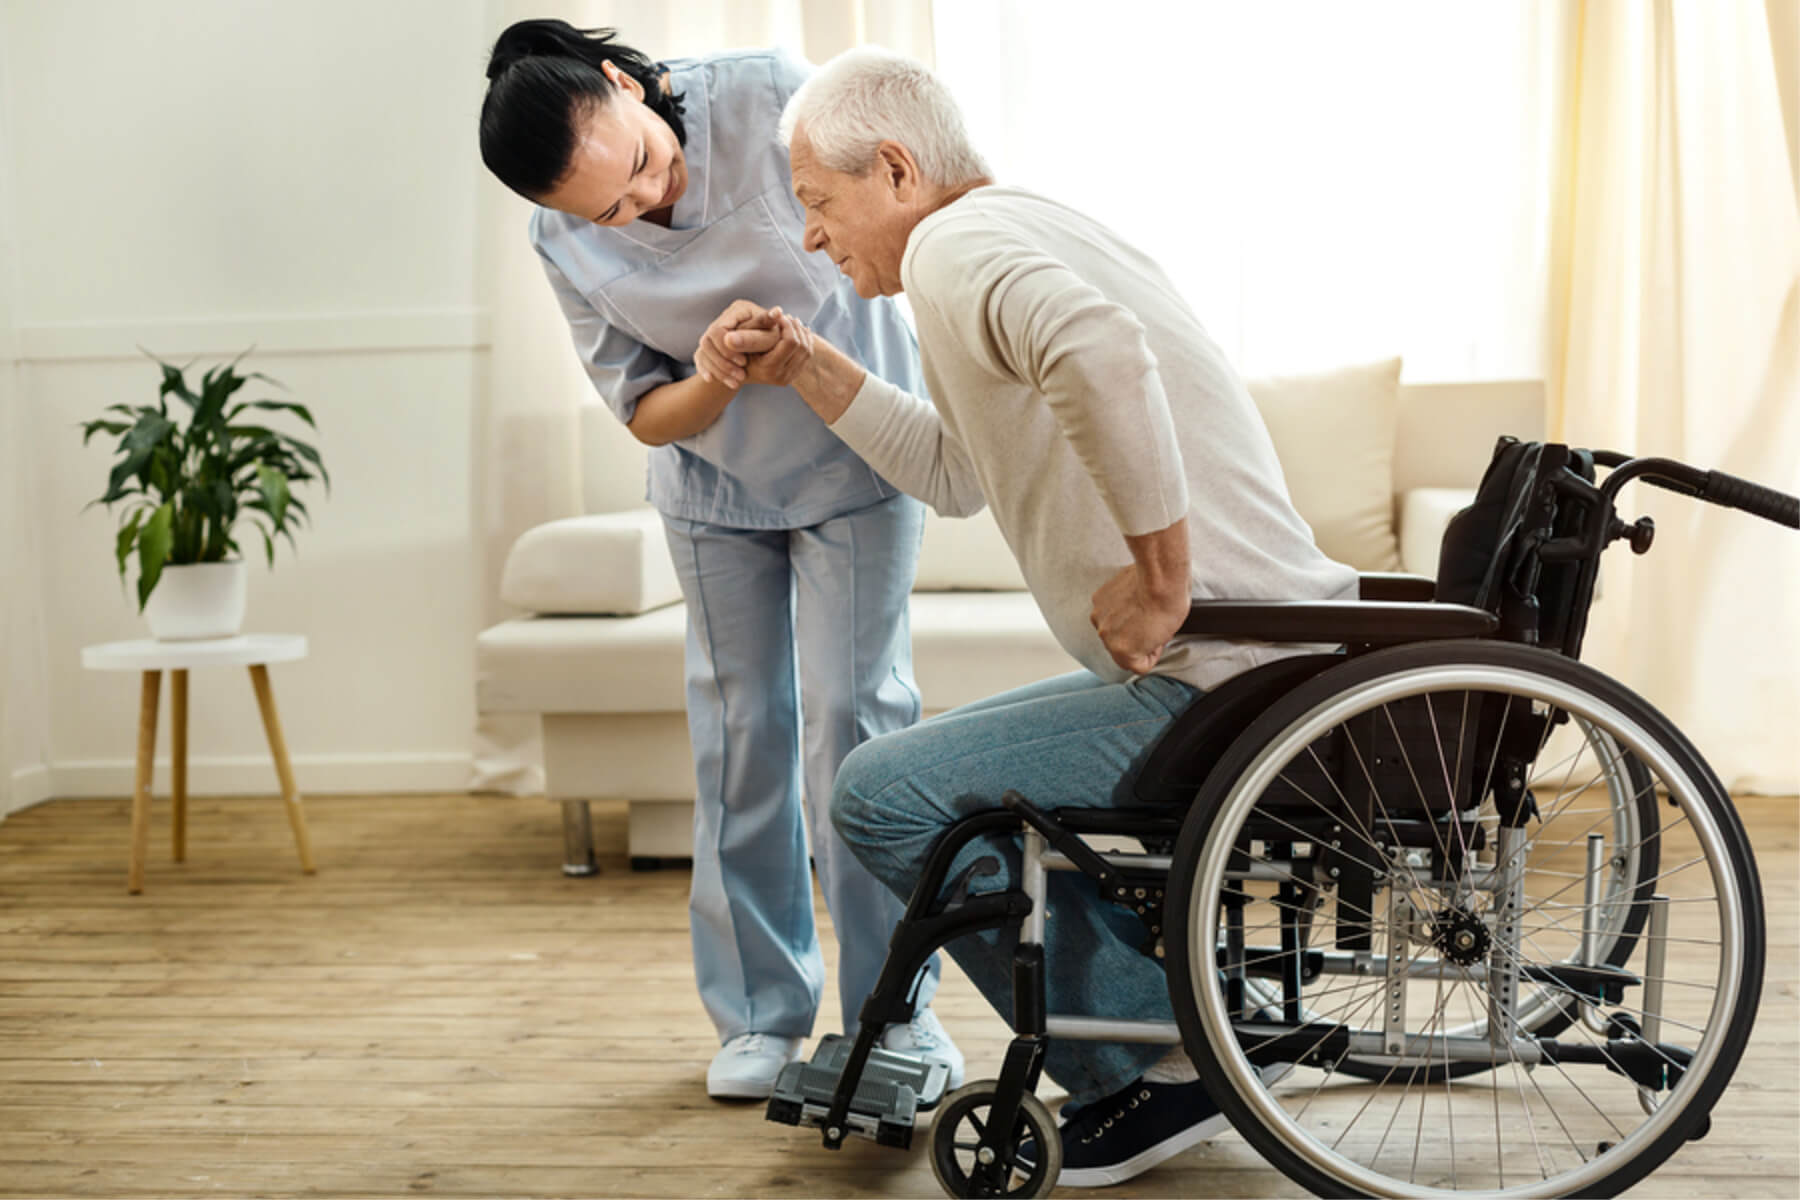 Caregiver in Daphne AL: Immobilization